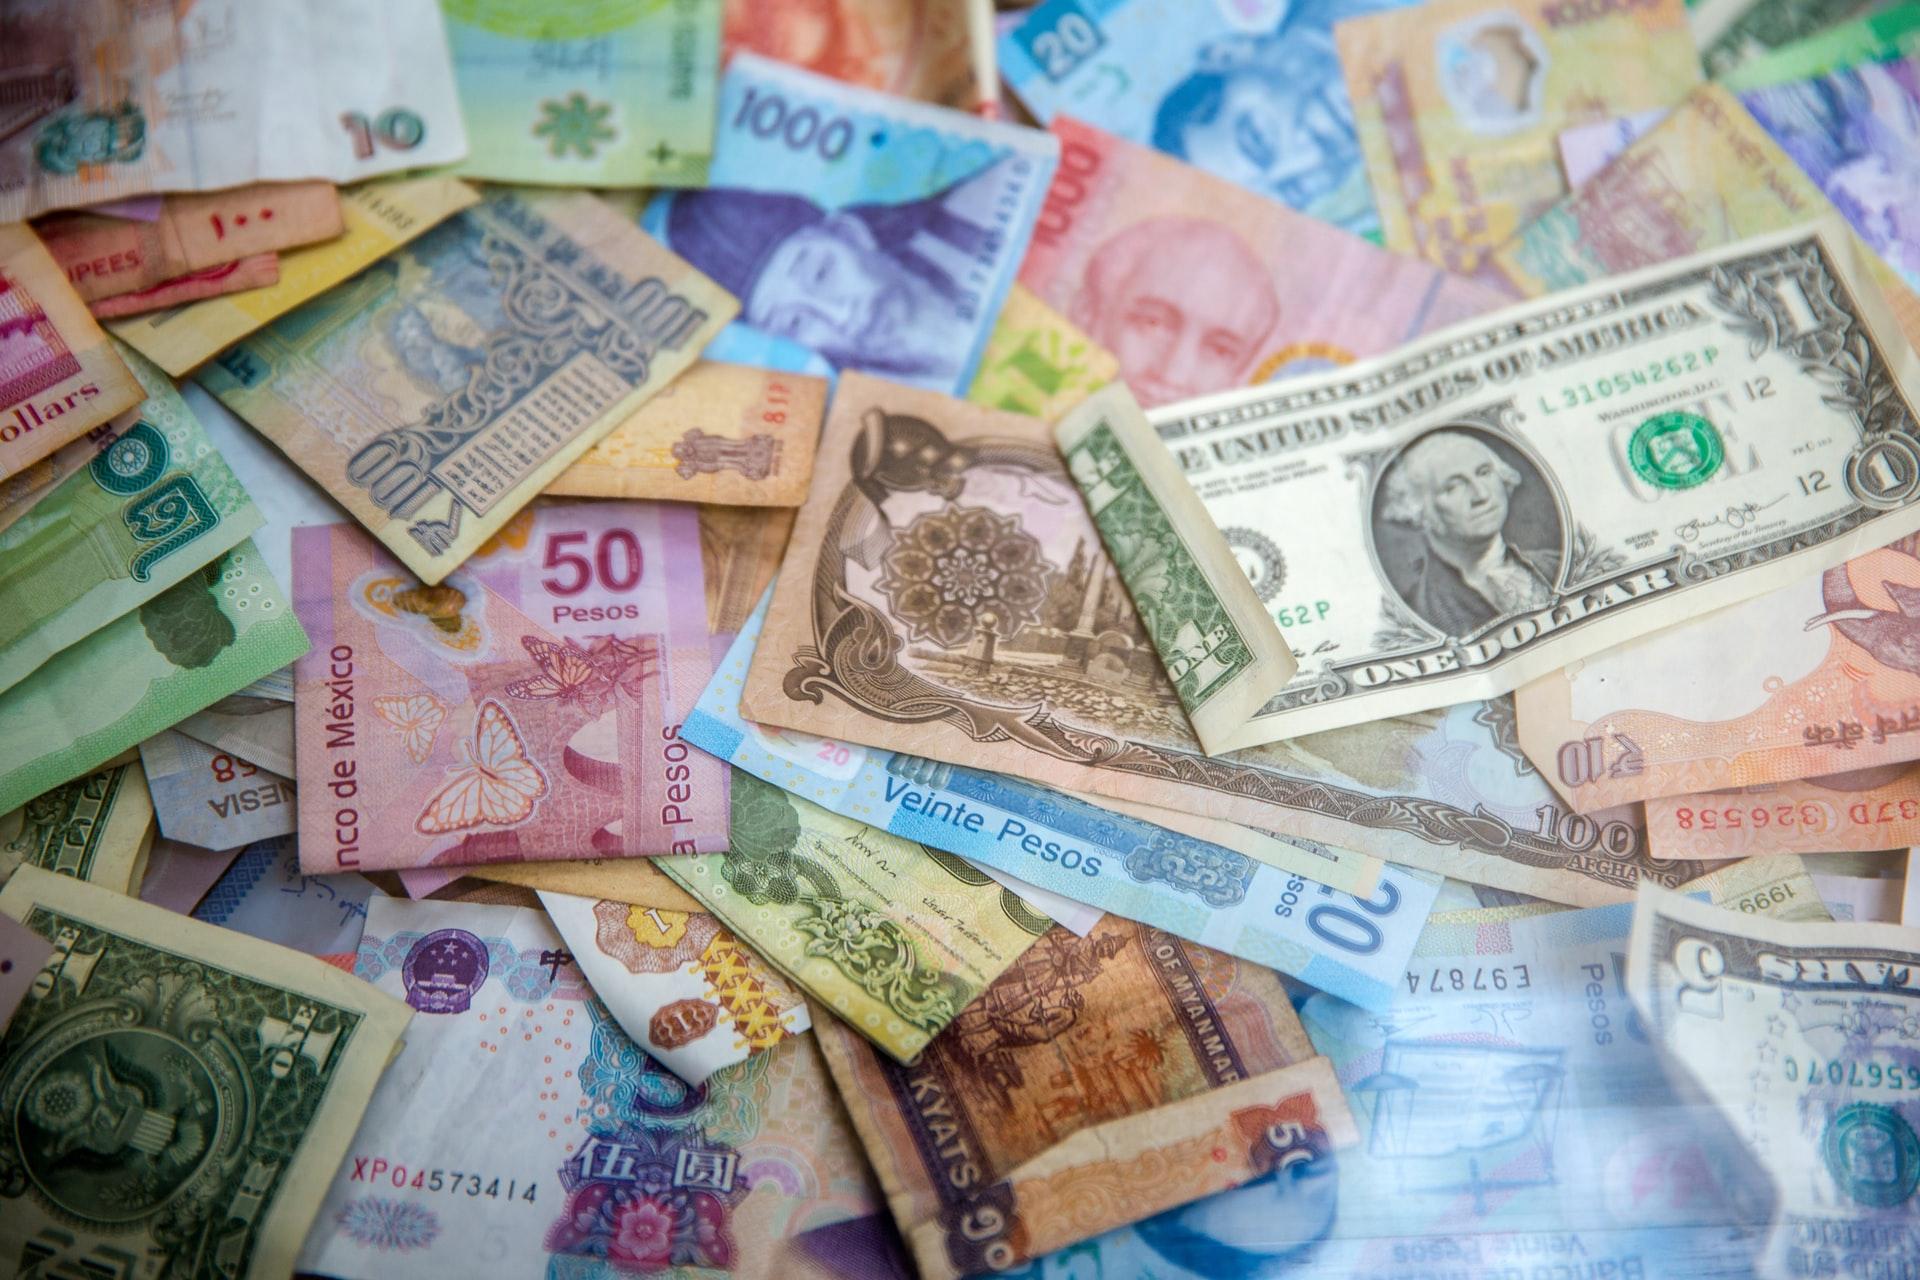 A pile of international money.